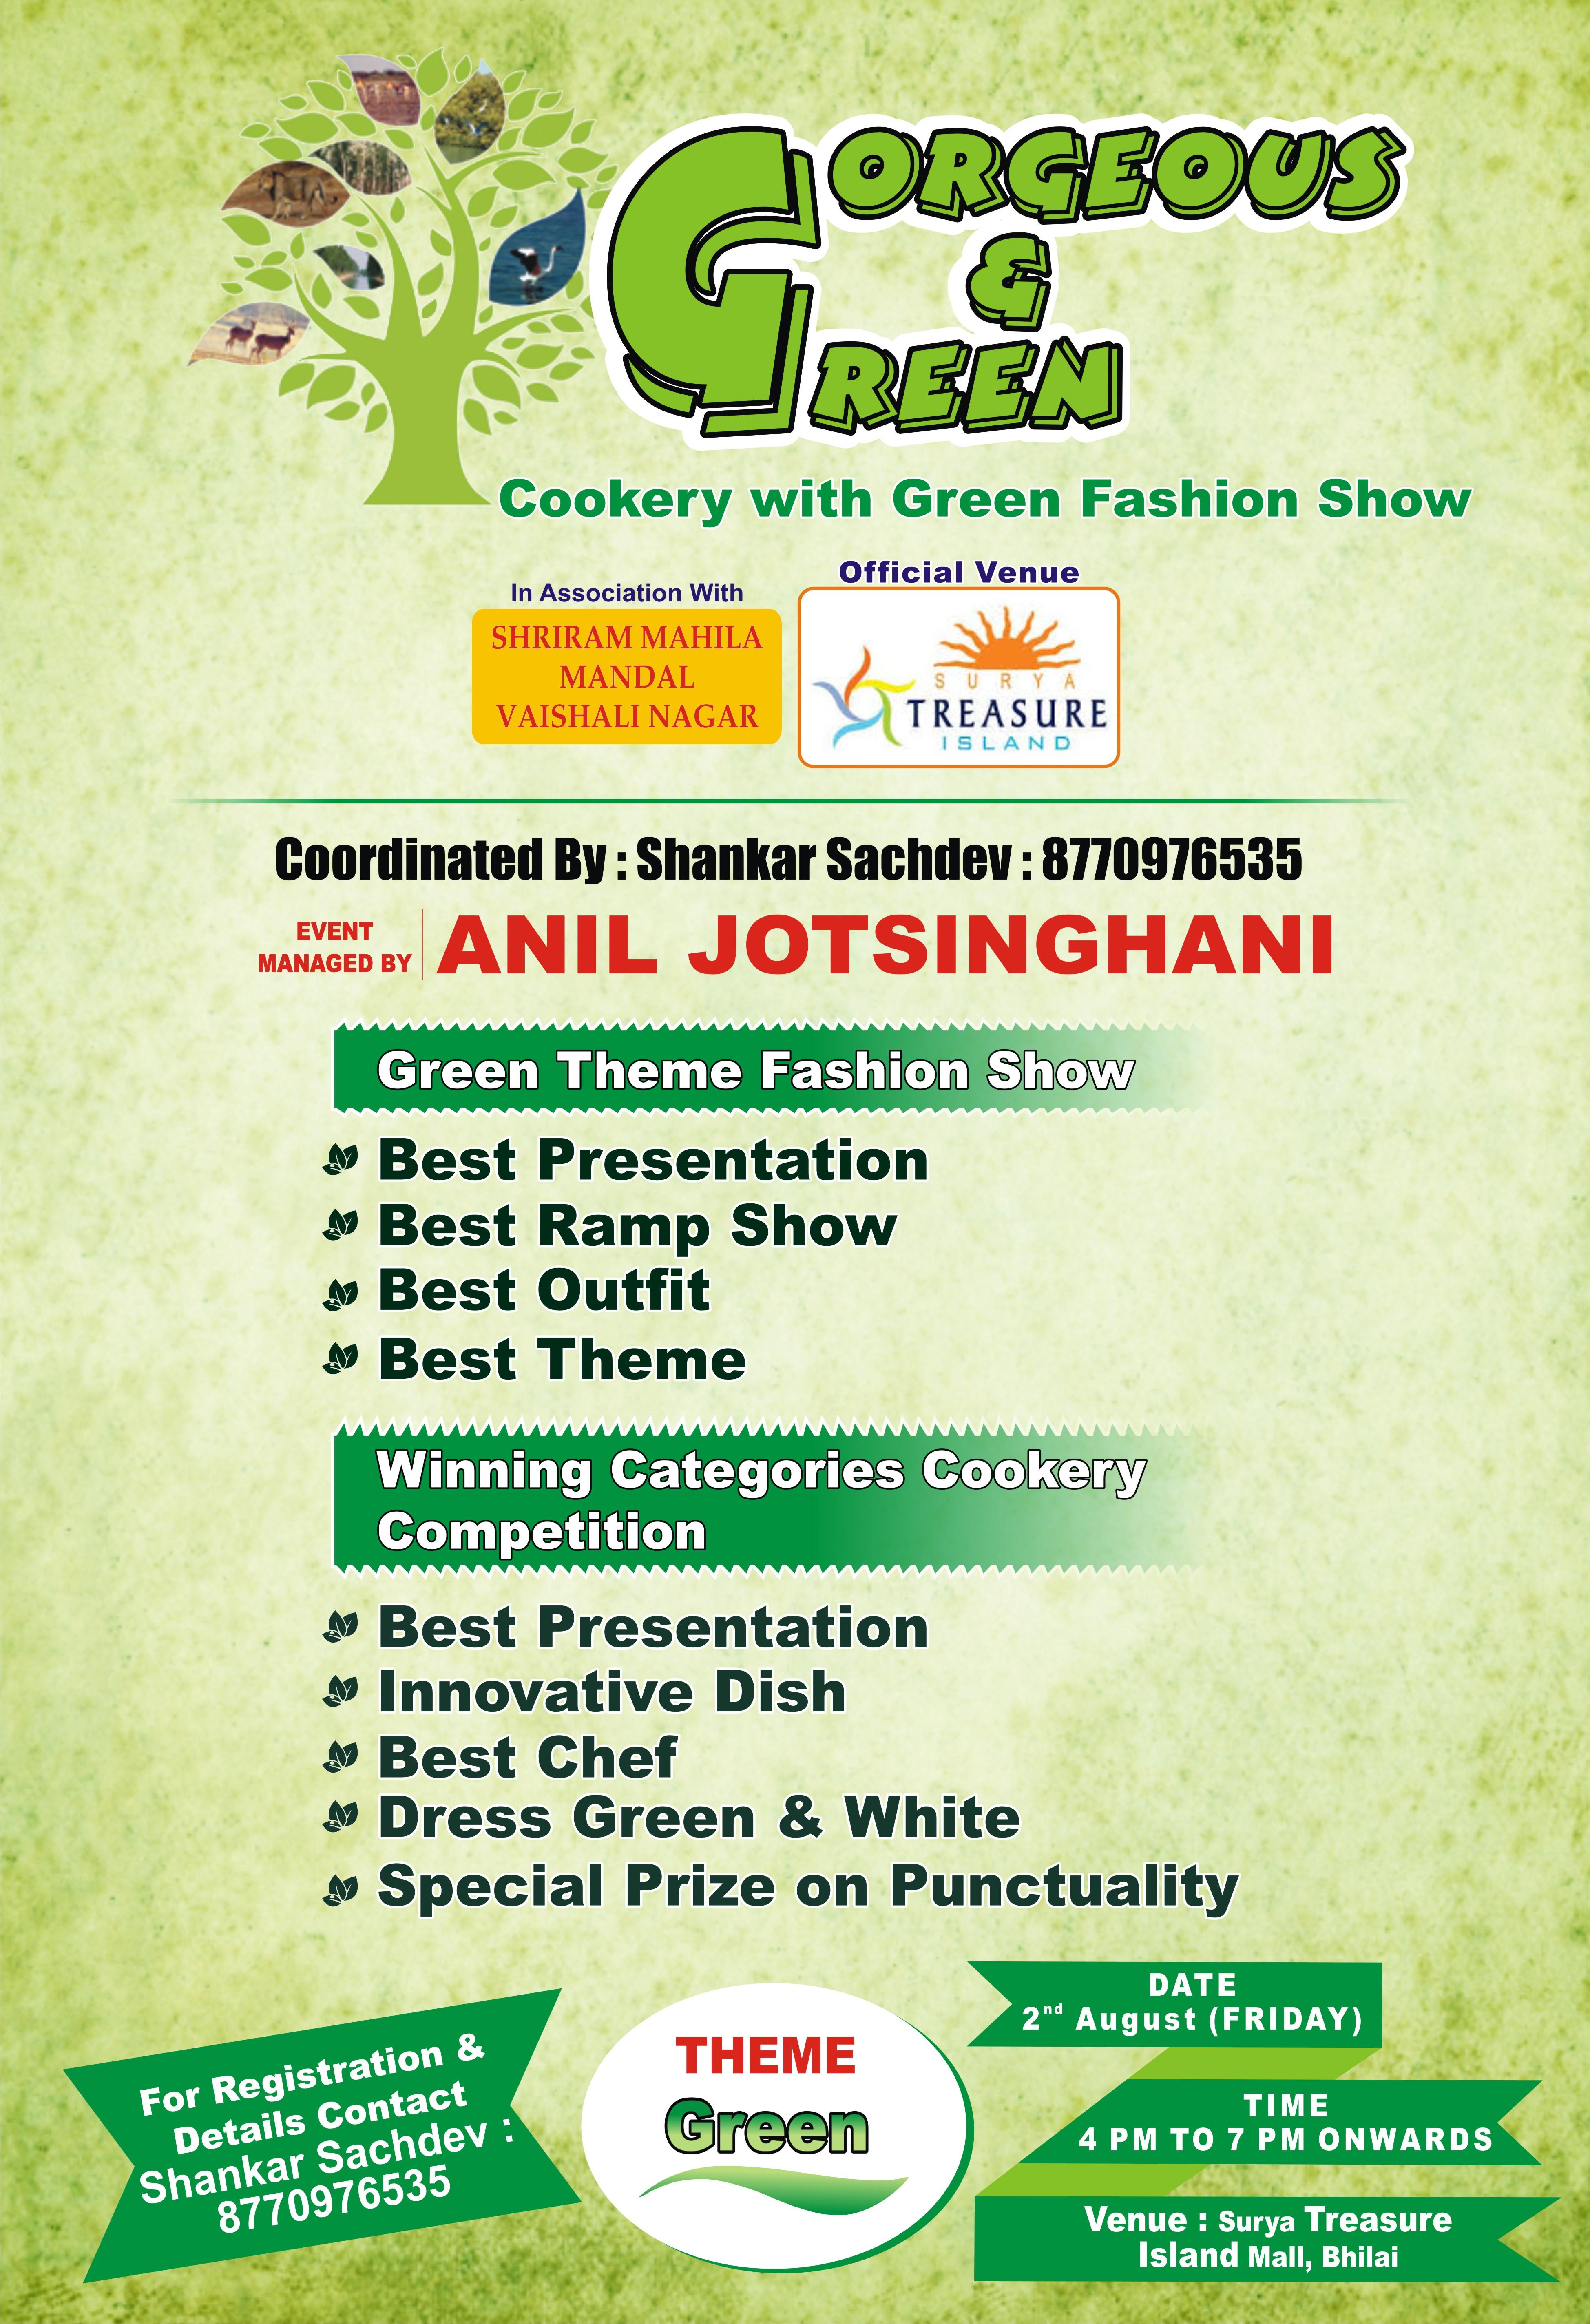 Surya Mall Events